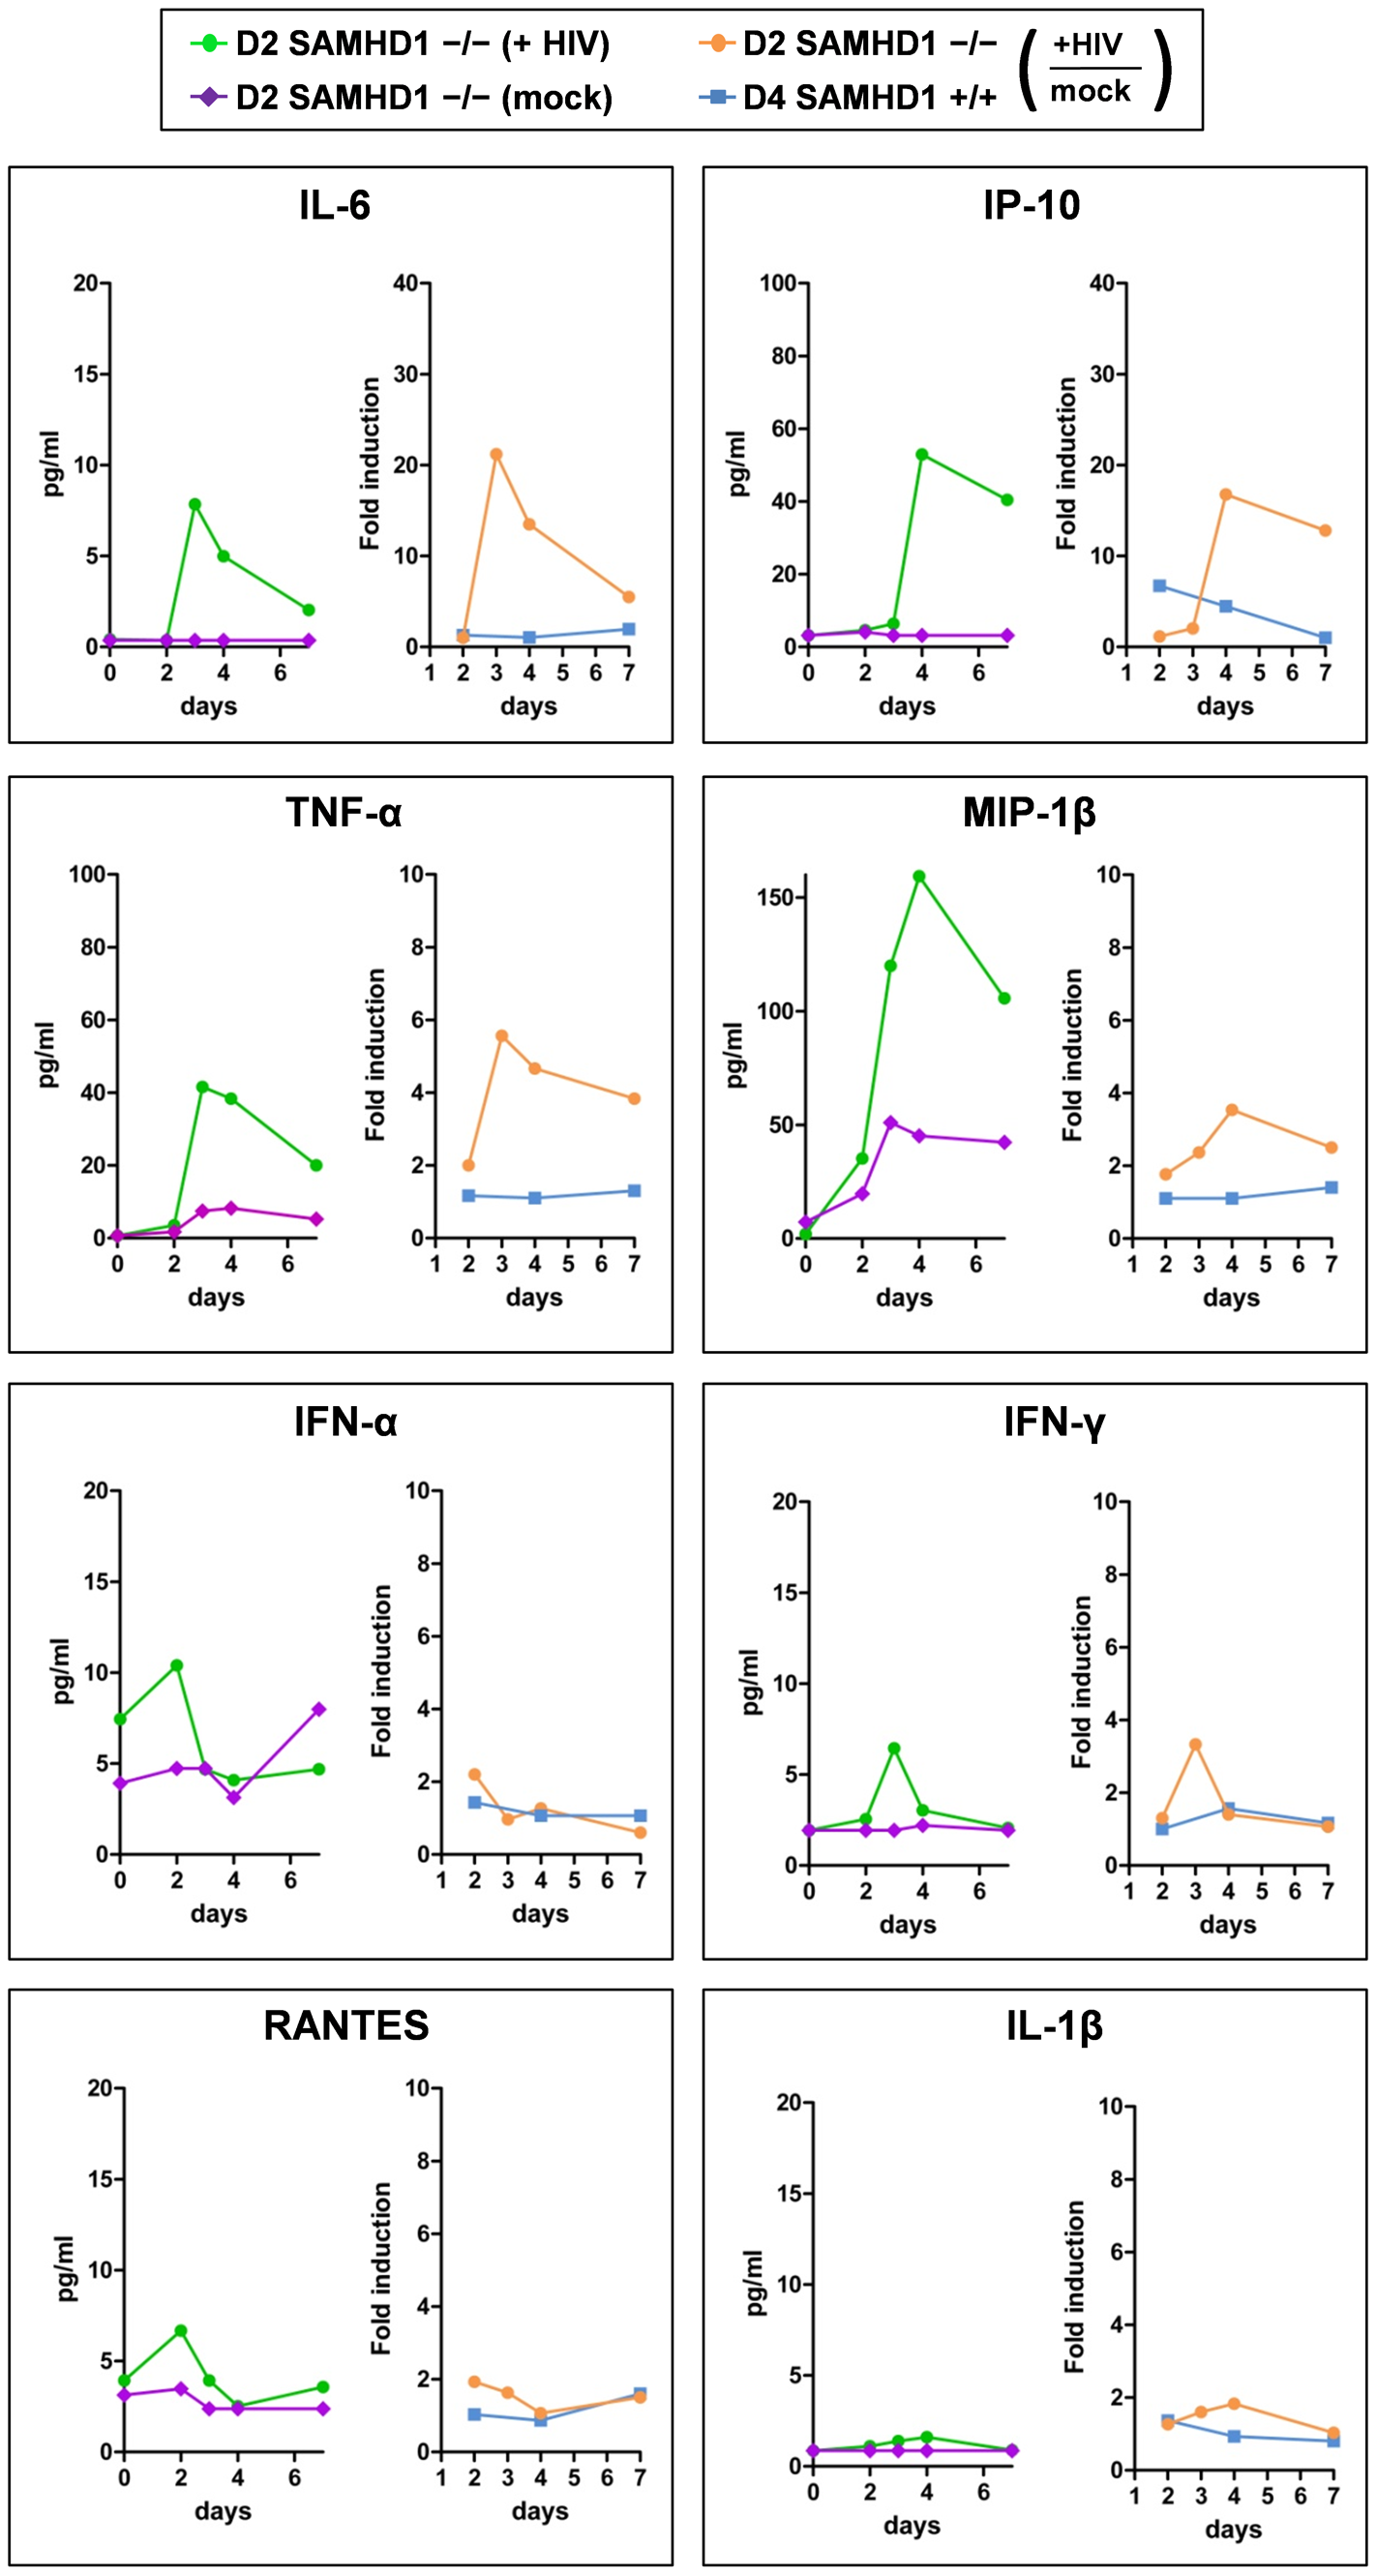 Cytokine secretion of PBMC lacking SAMHD1 indicates an early inflammatory response during HIV-1 replication.